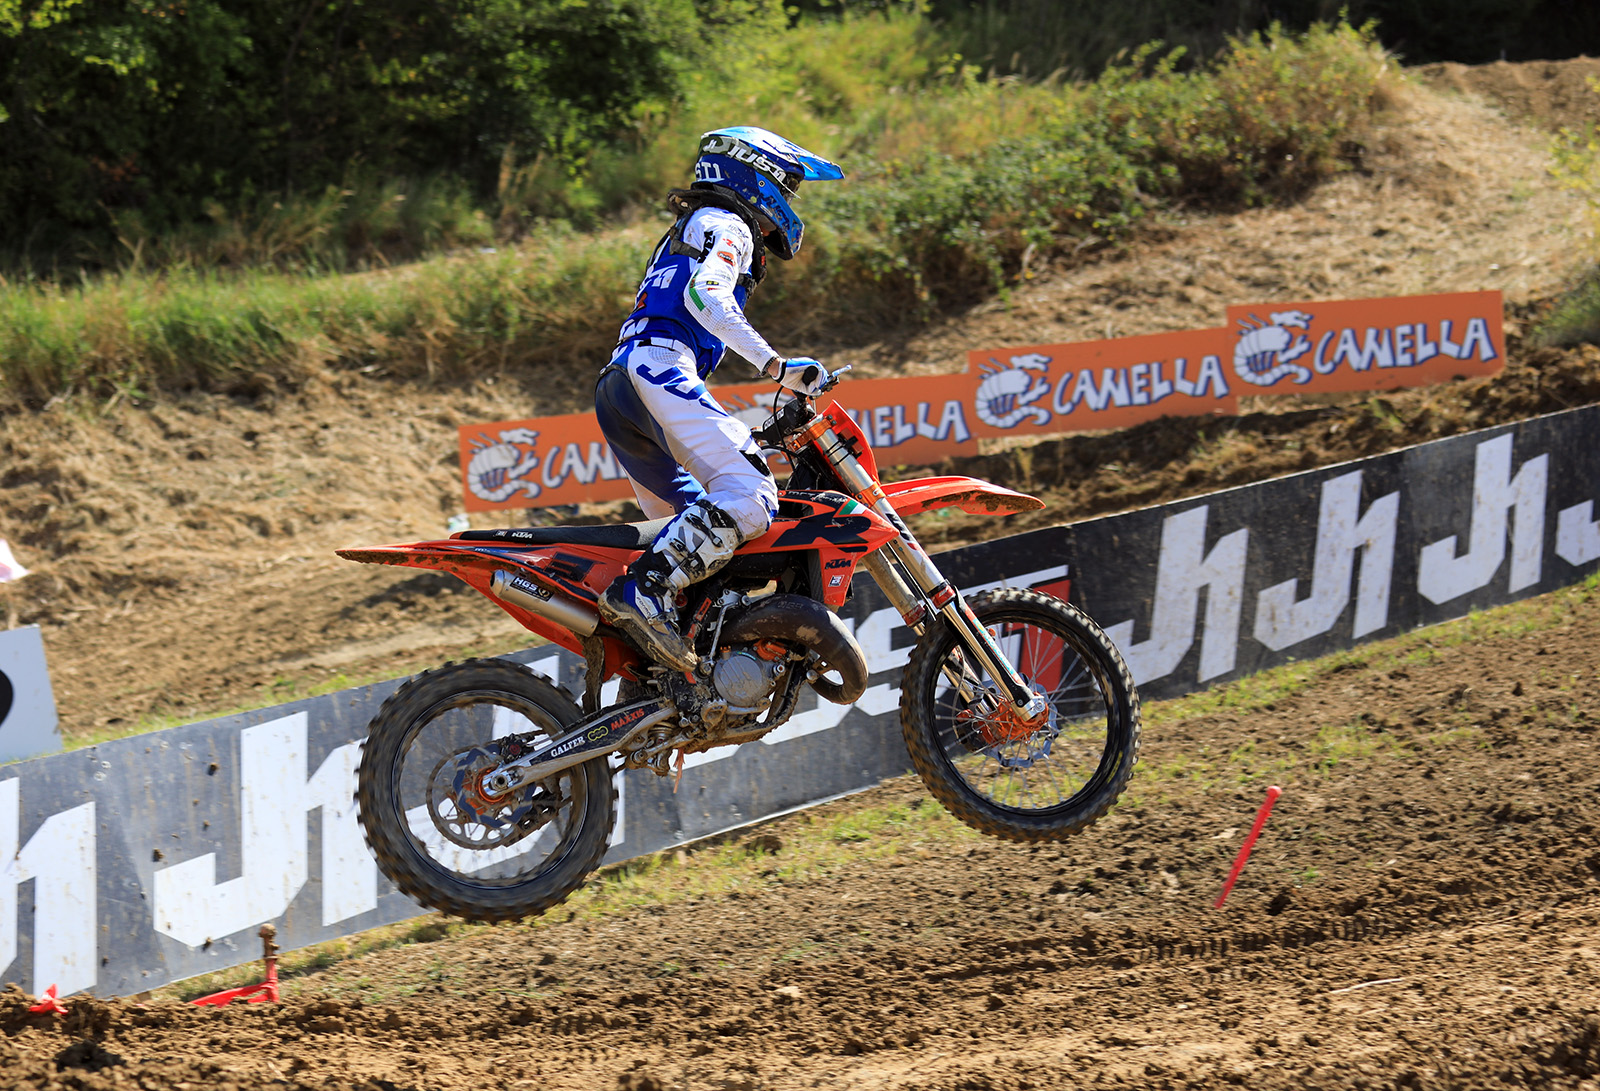 Weekend di gara con i Pata Talenti Azzurri FMI Motocross protagonisti su più fronti thumbnail